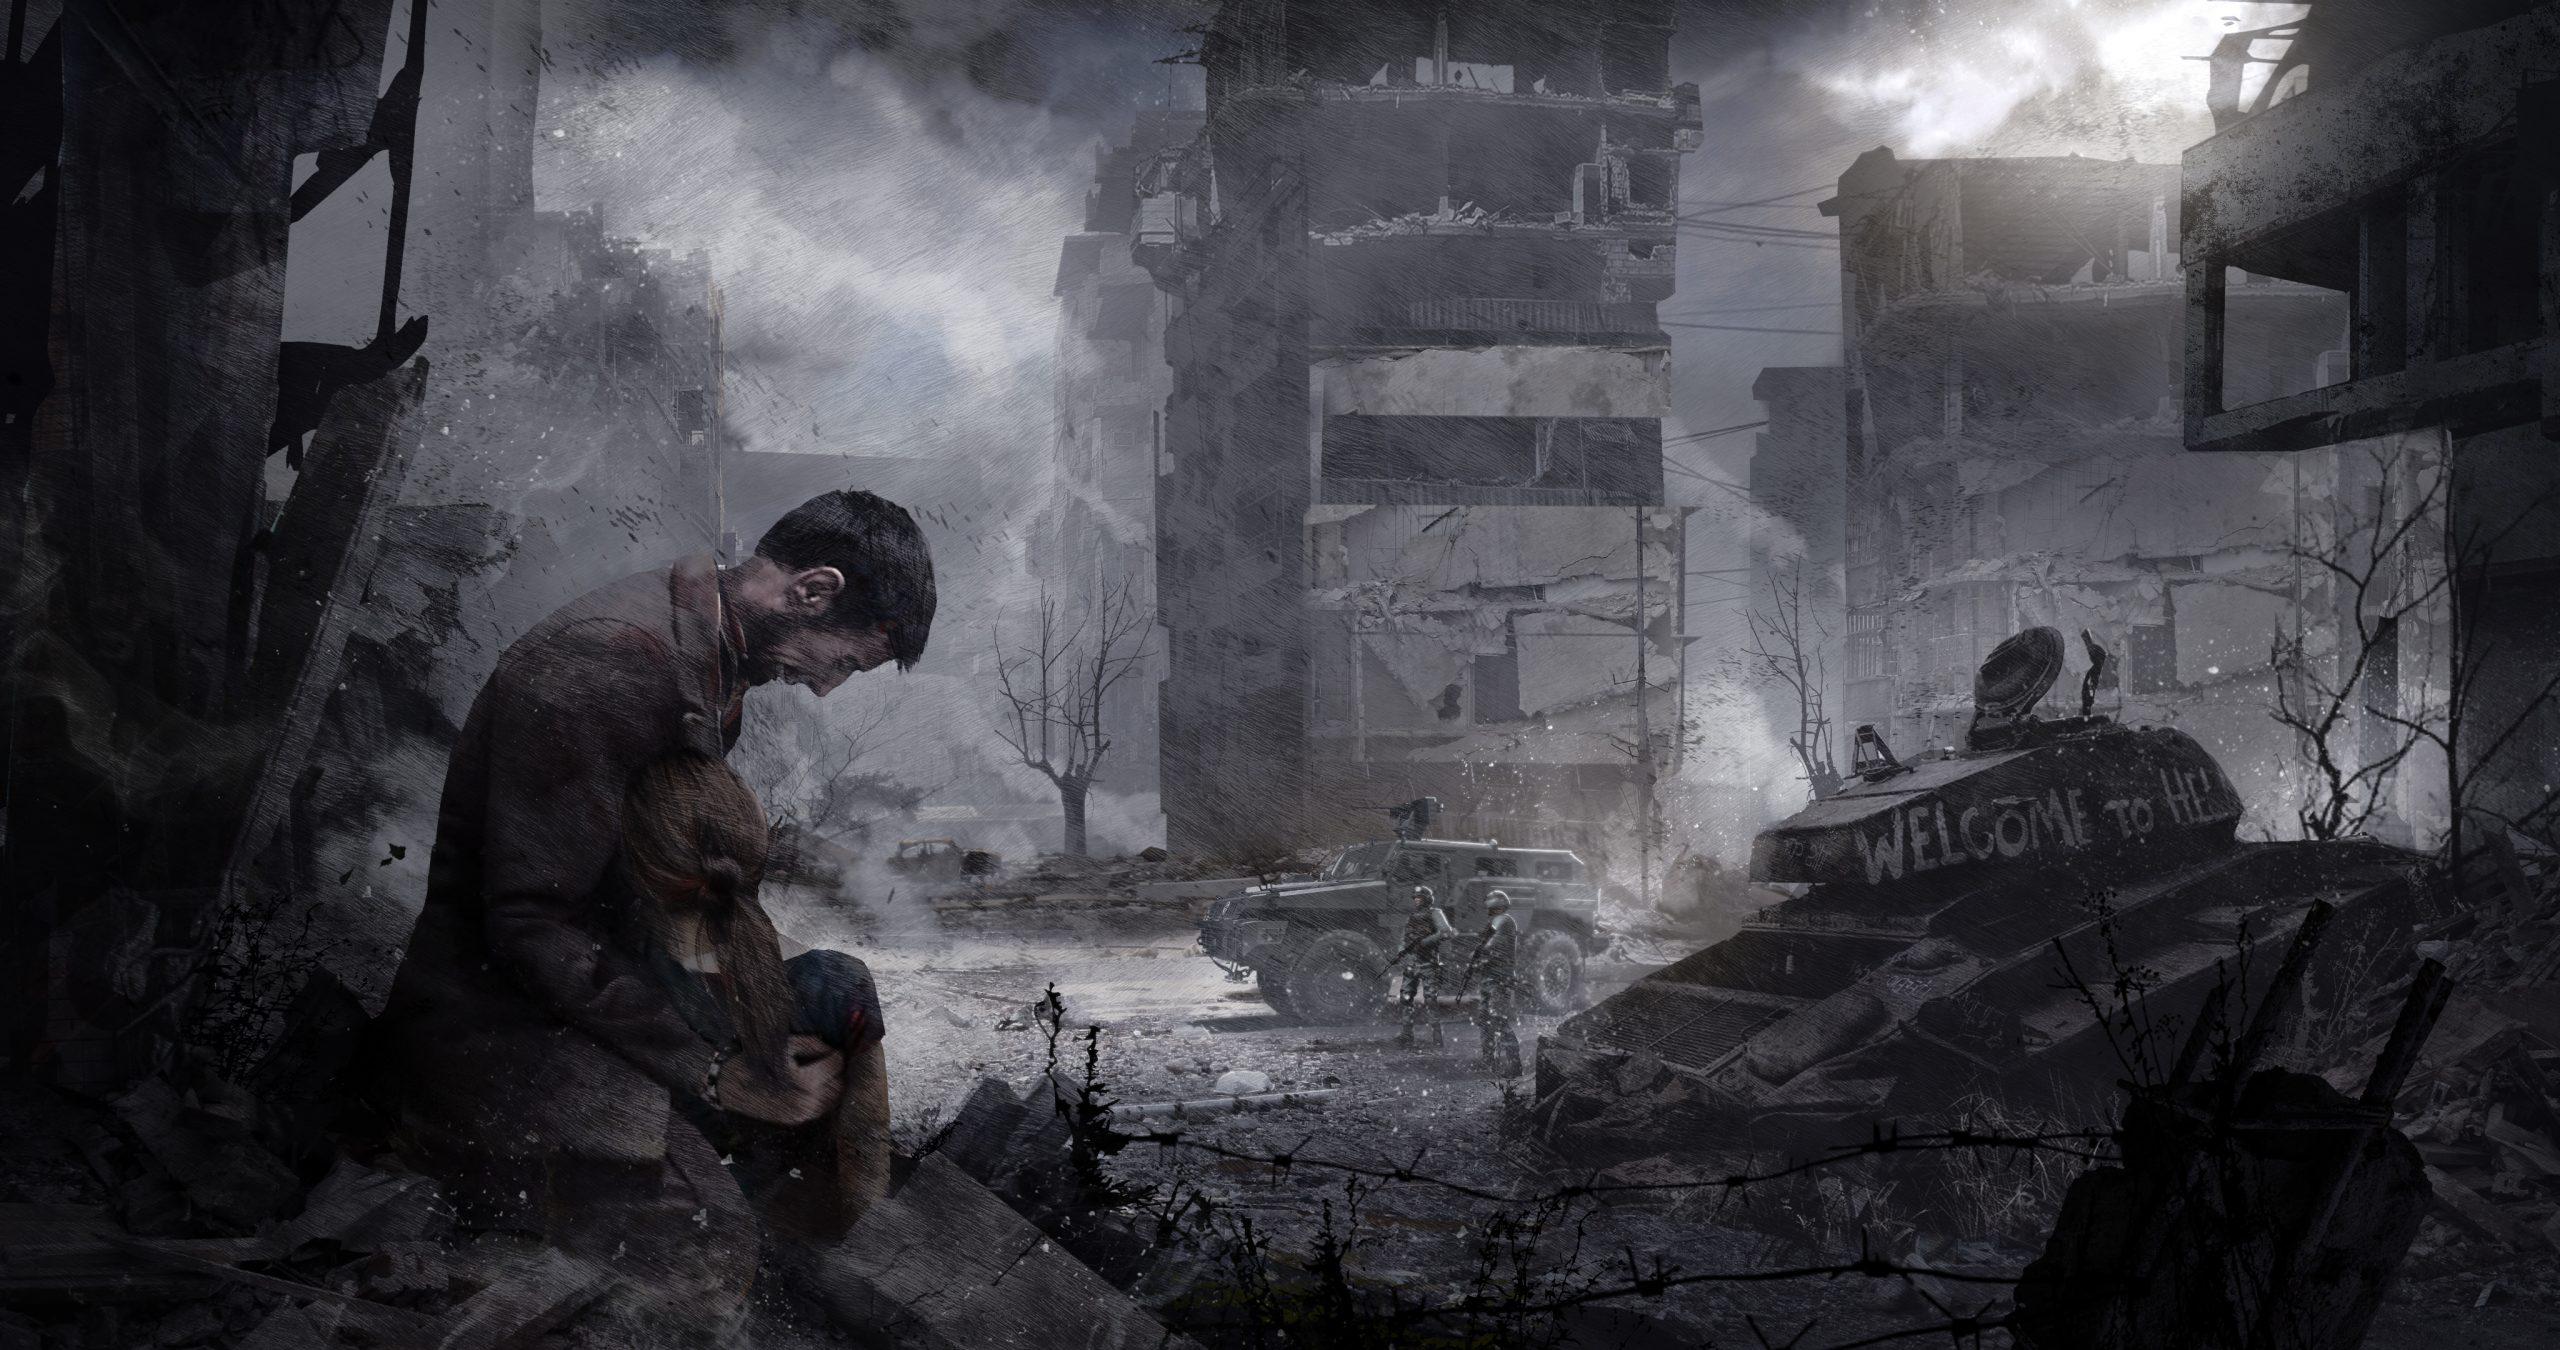 postać męska na tle ruin miasta